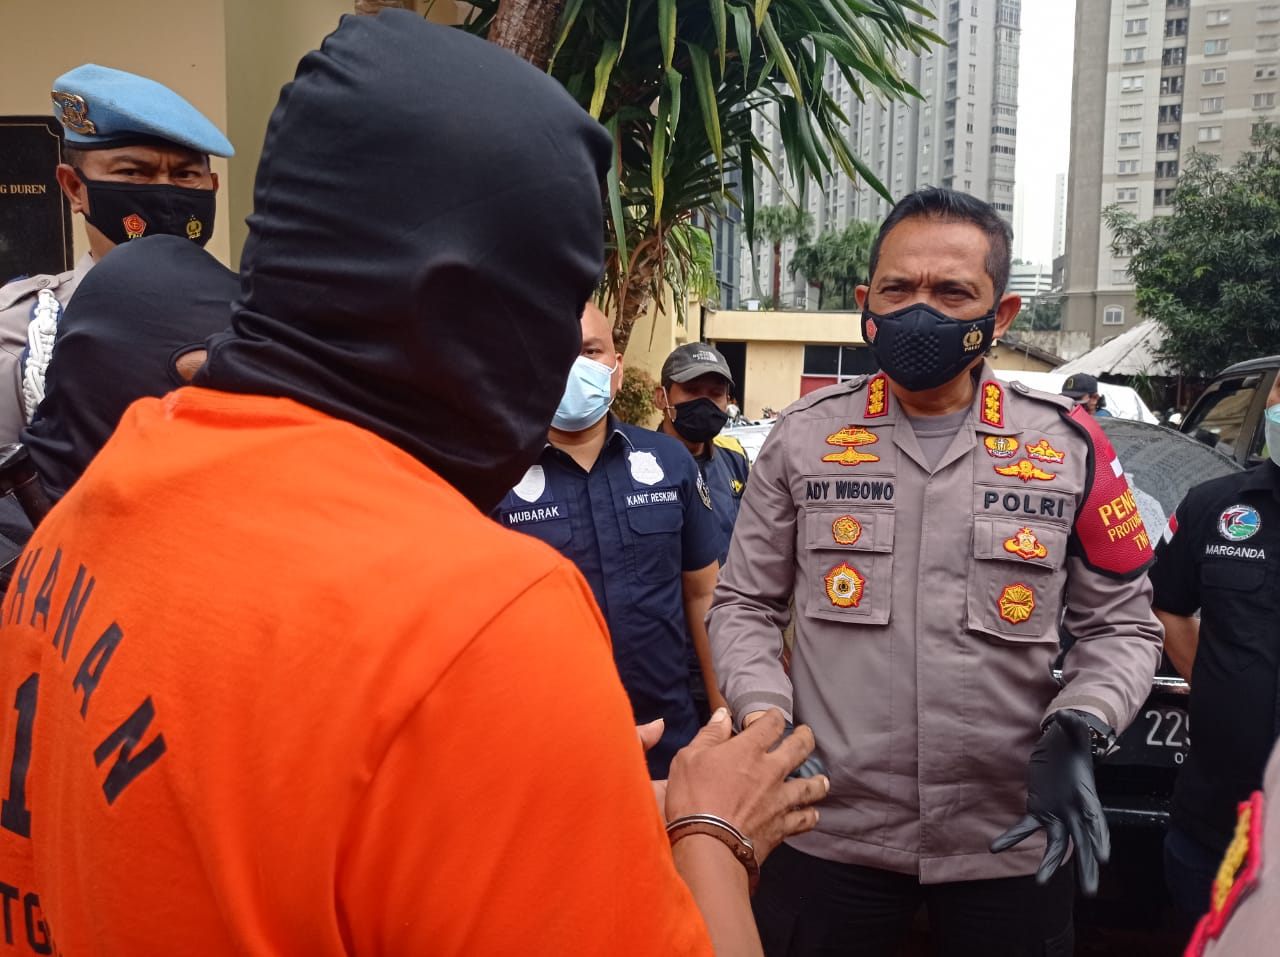 Kapolres Jakbar tengah mewawancarai bandar narkoba. (Foto: PMJ News).